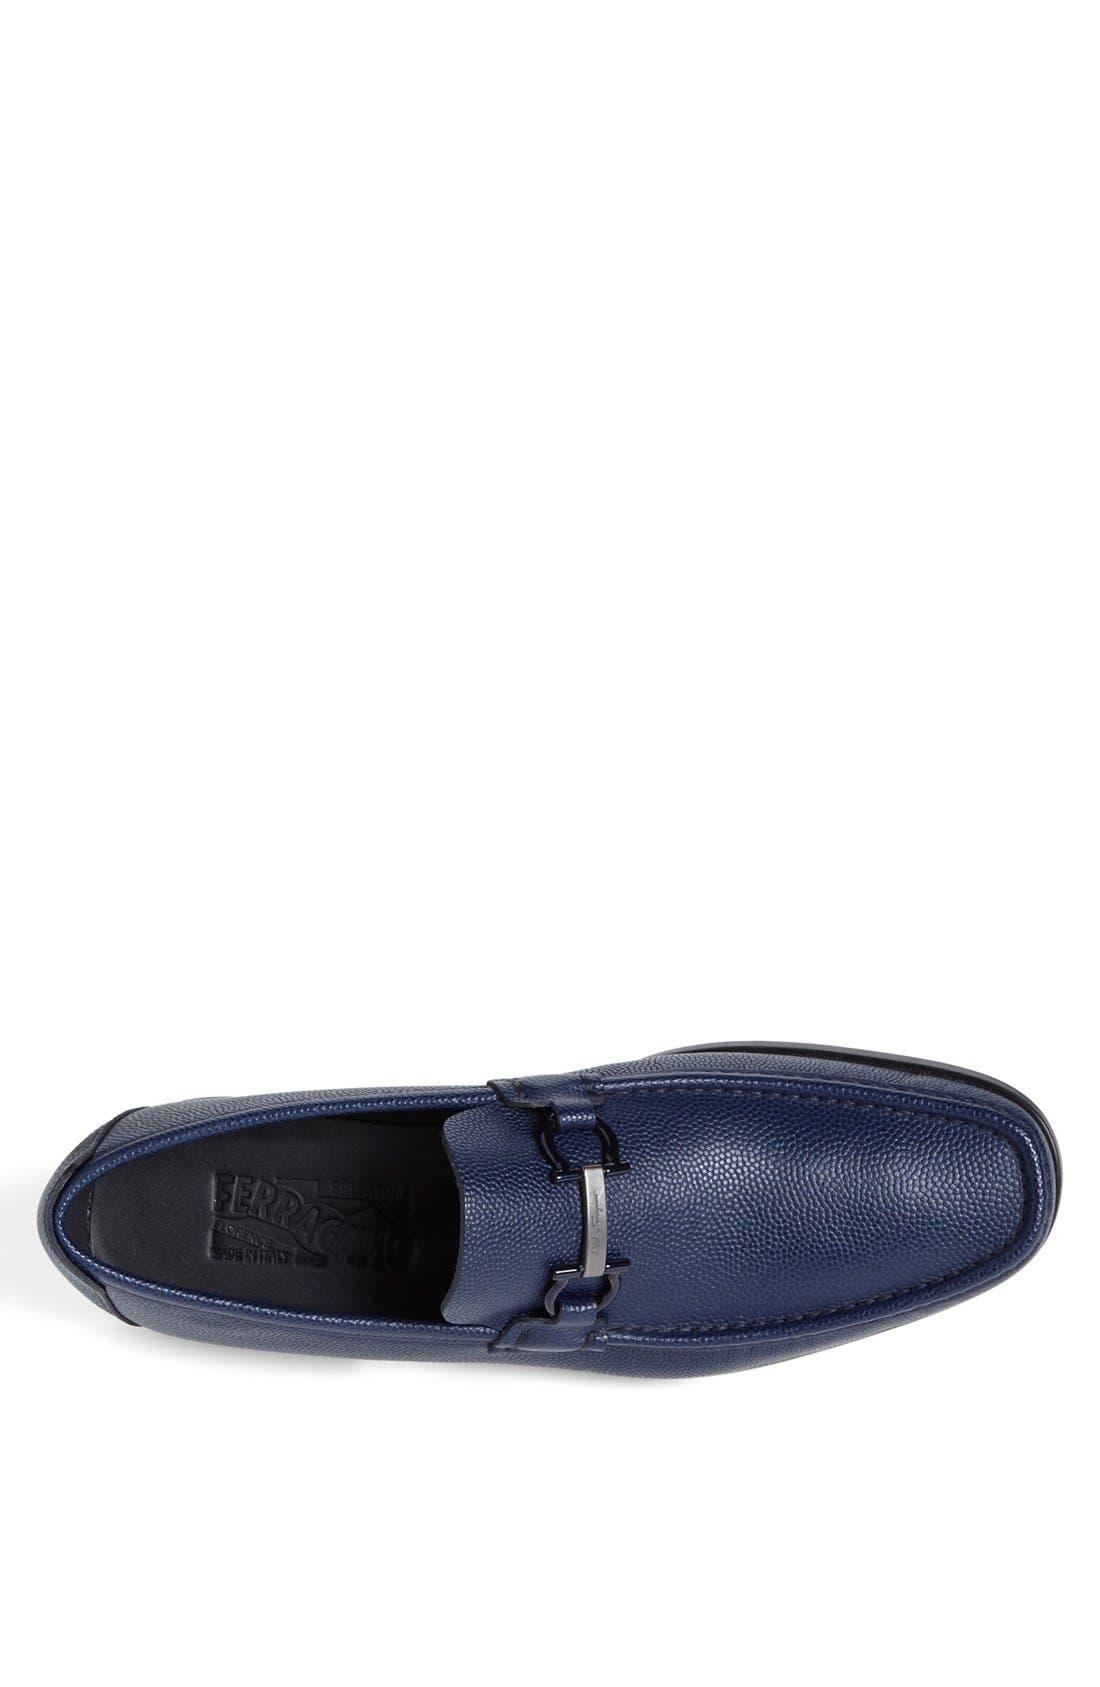 Alternate Image 3  - Salvatore Ferragamo 'Regal' Pebbled Leather Loafer